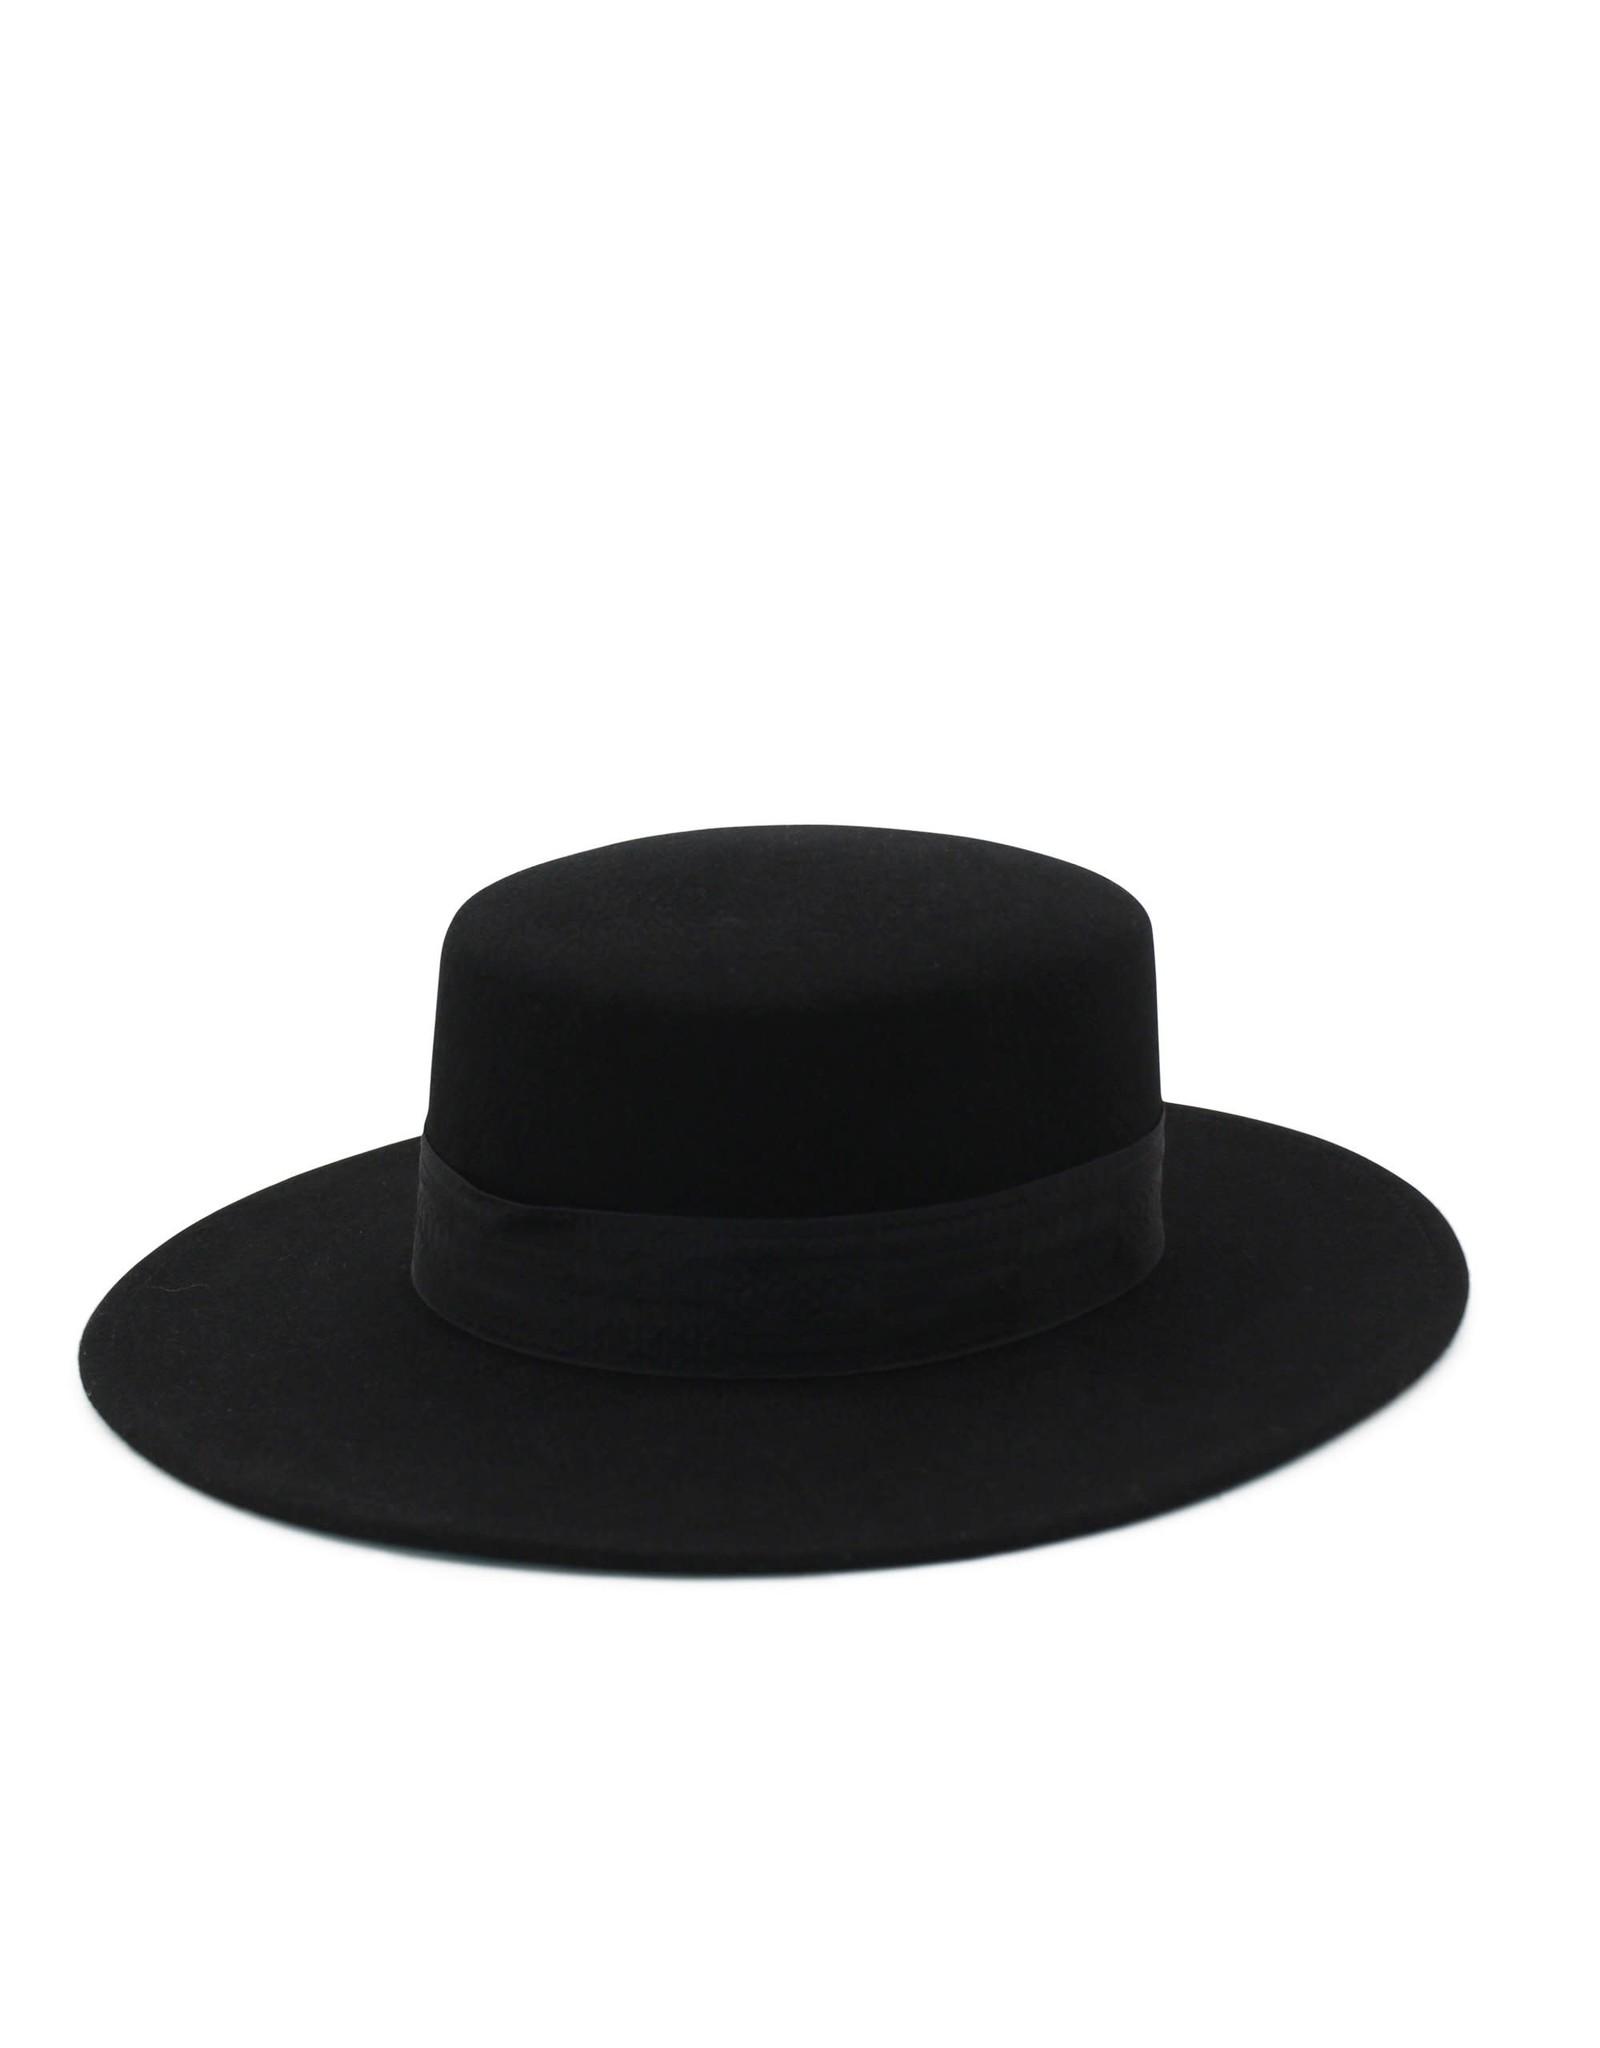 Ace of Something Ace of Something - Gunsmoke boater with black ribbon trim (black)